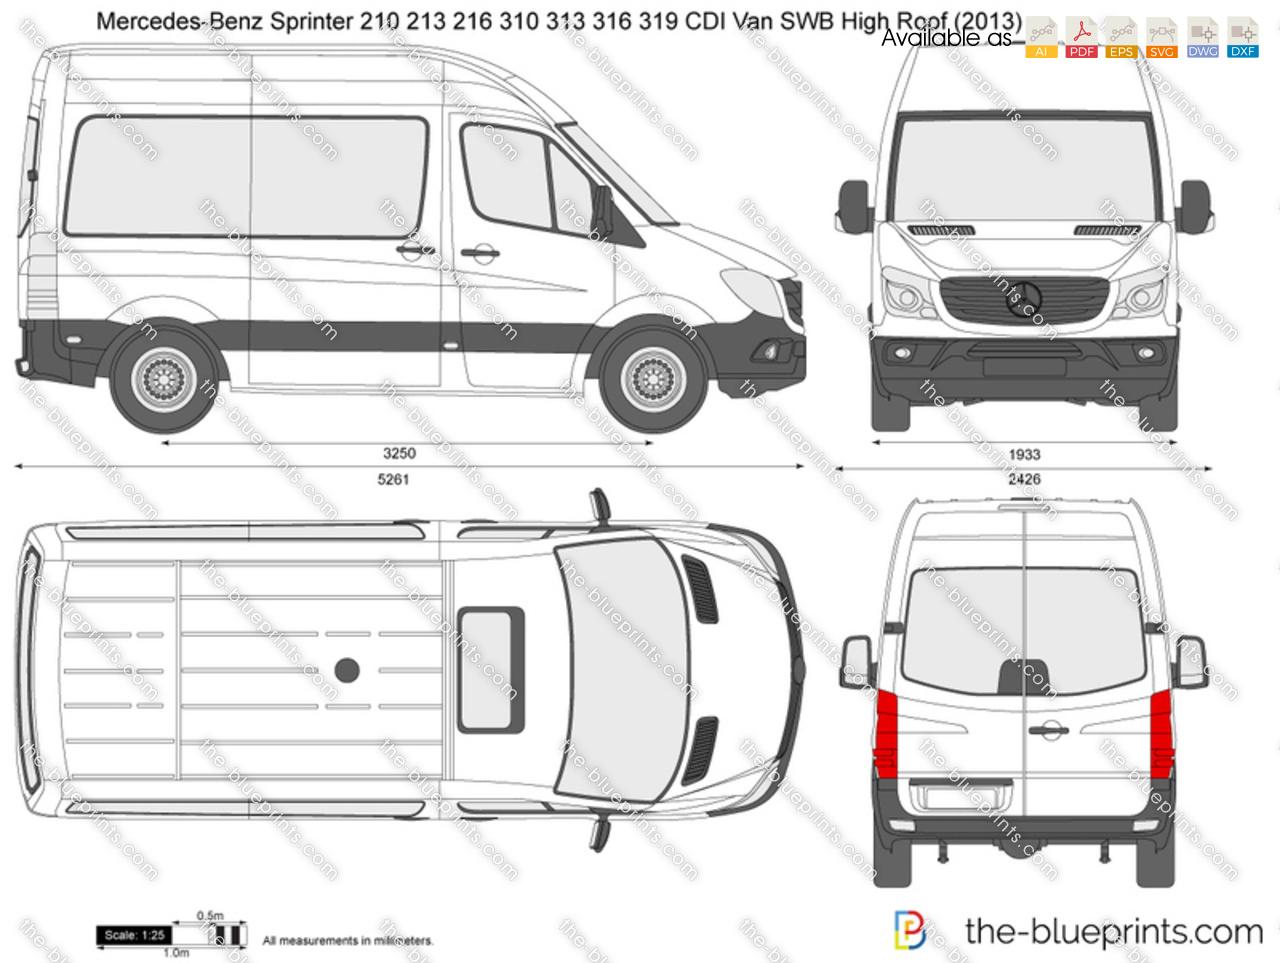 Mercedes Benz Sprinter 210 213 216 310 313 316 319 Cdi Van